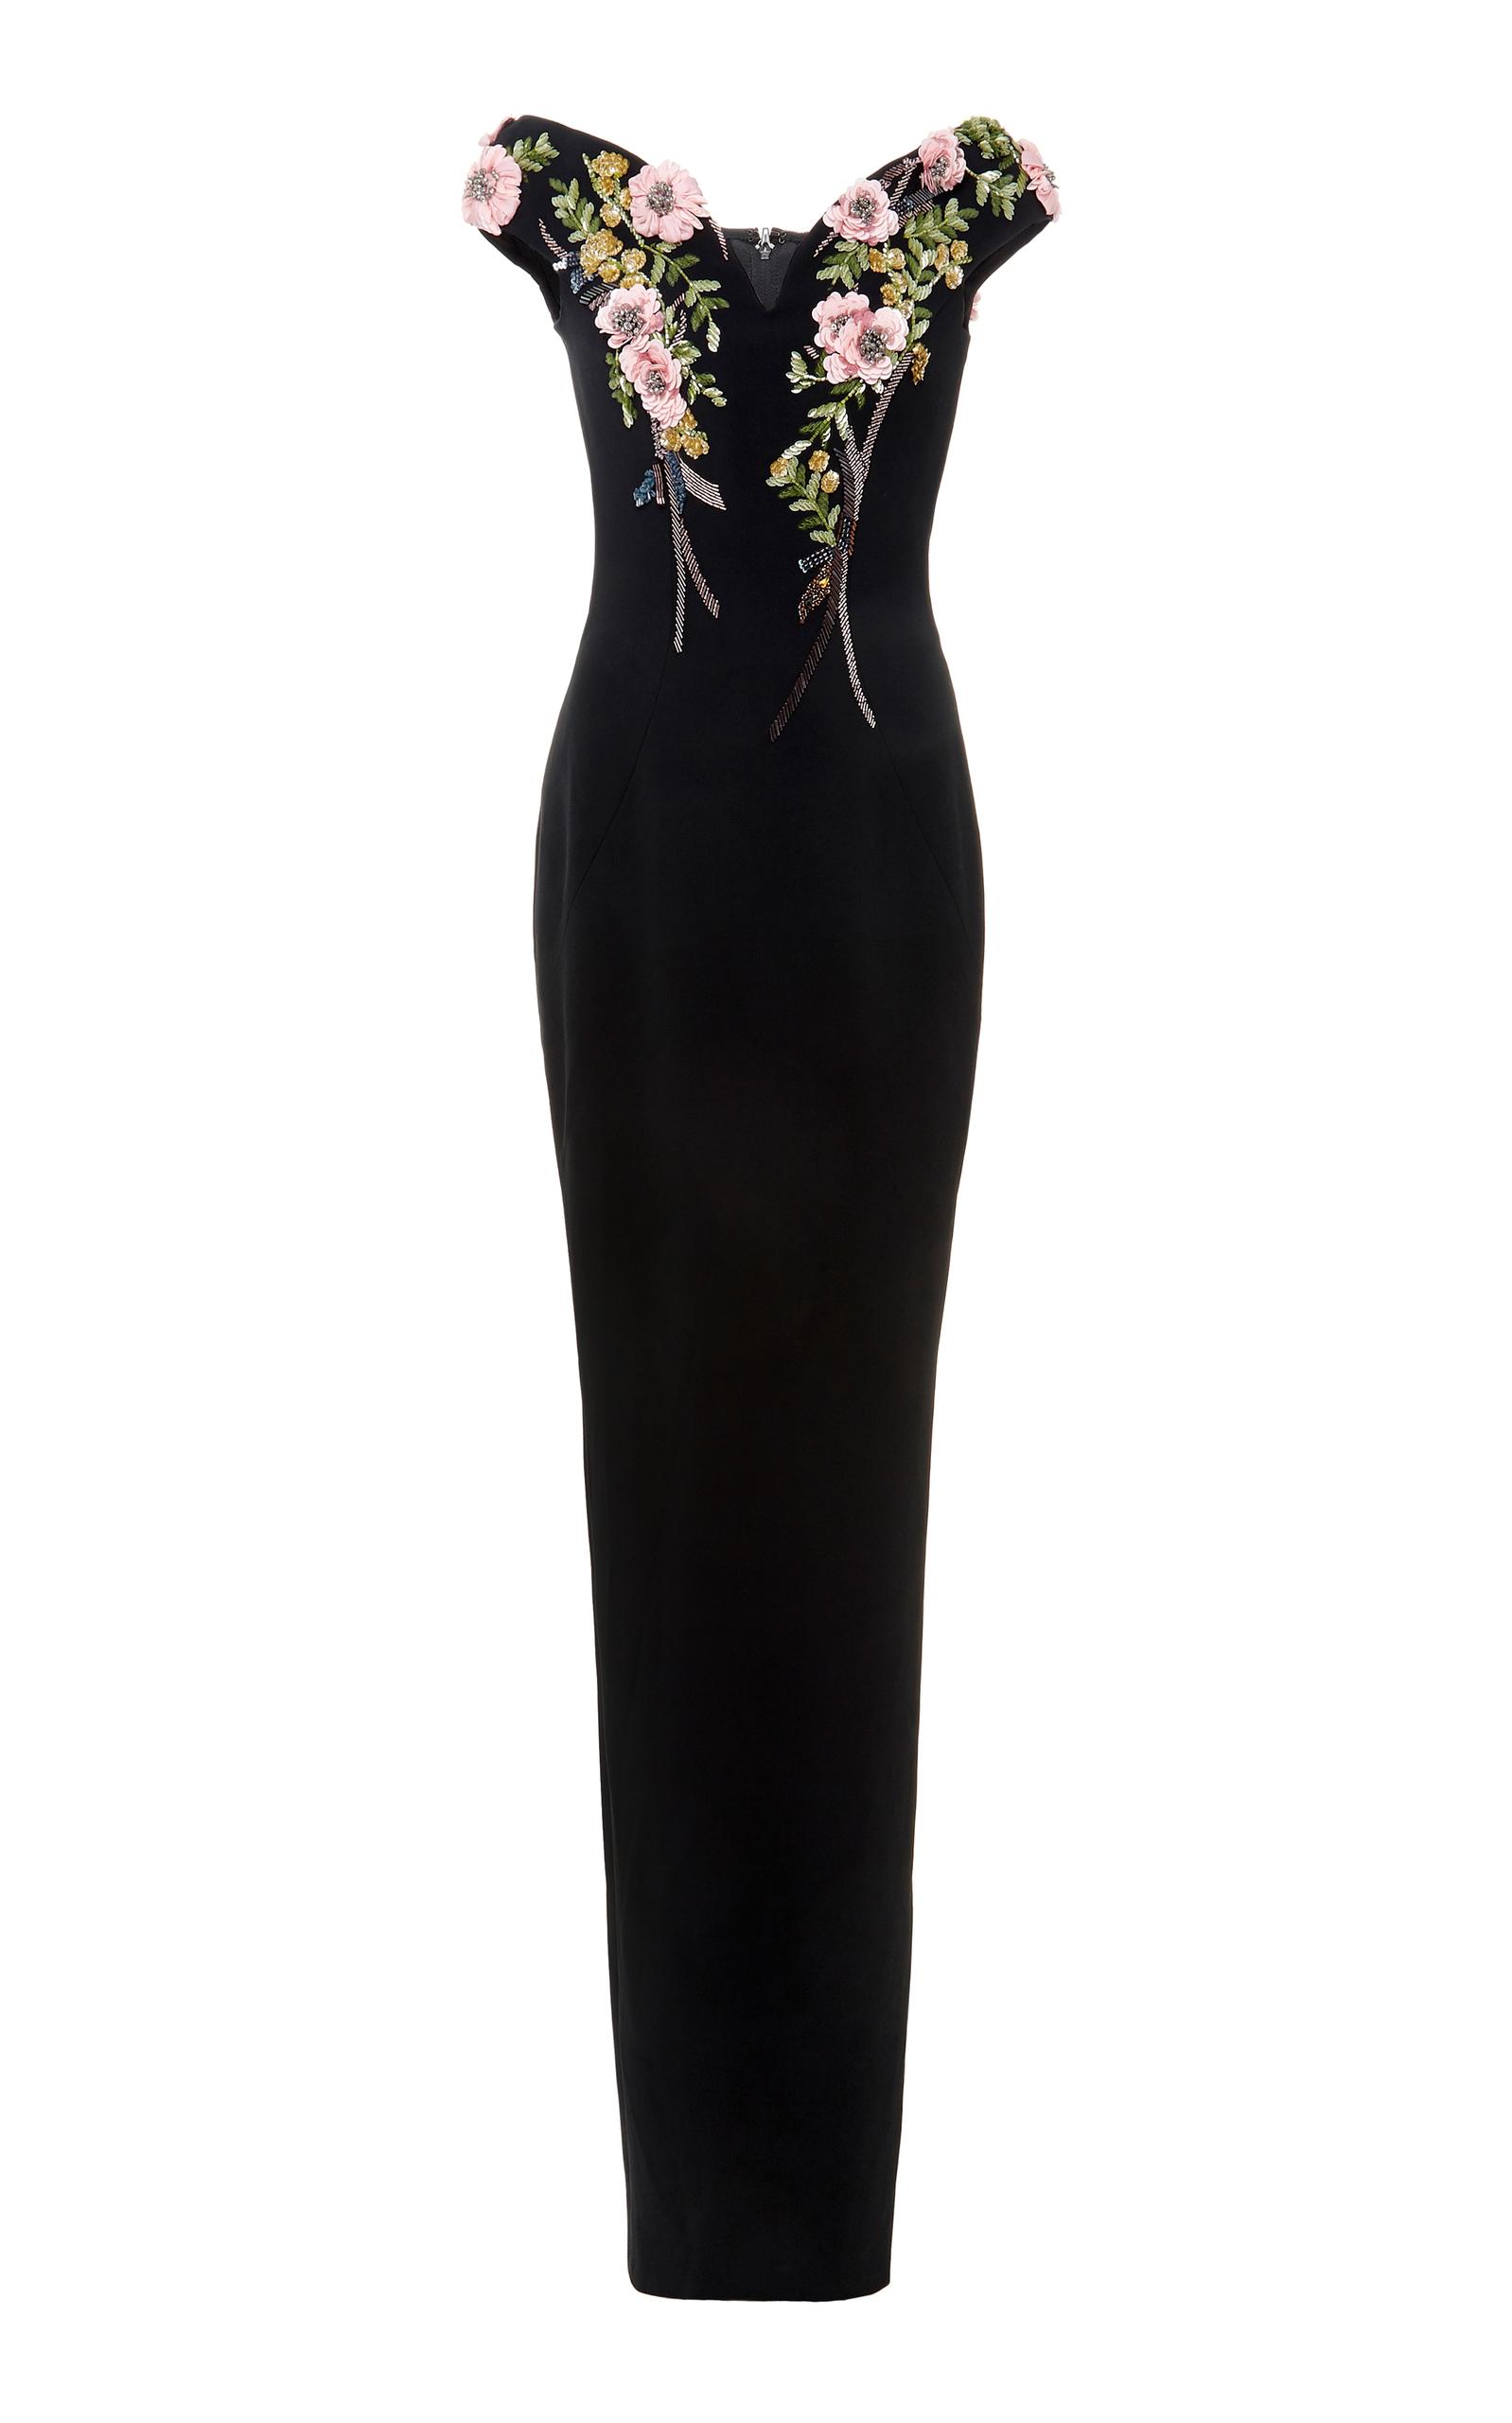 floral en Neck cristal Bateau crepé Pamella Roland bordado de de de Stretch noche vestido con wgPBgOH6qc